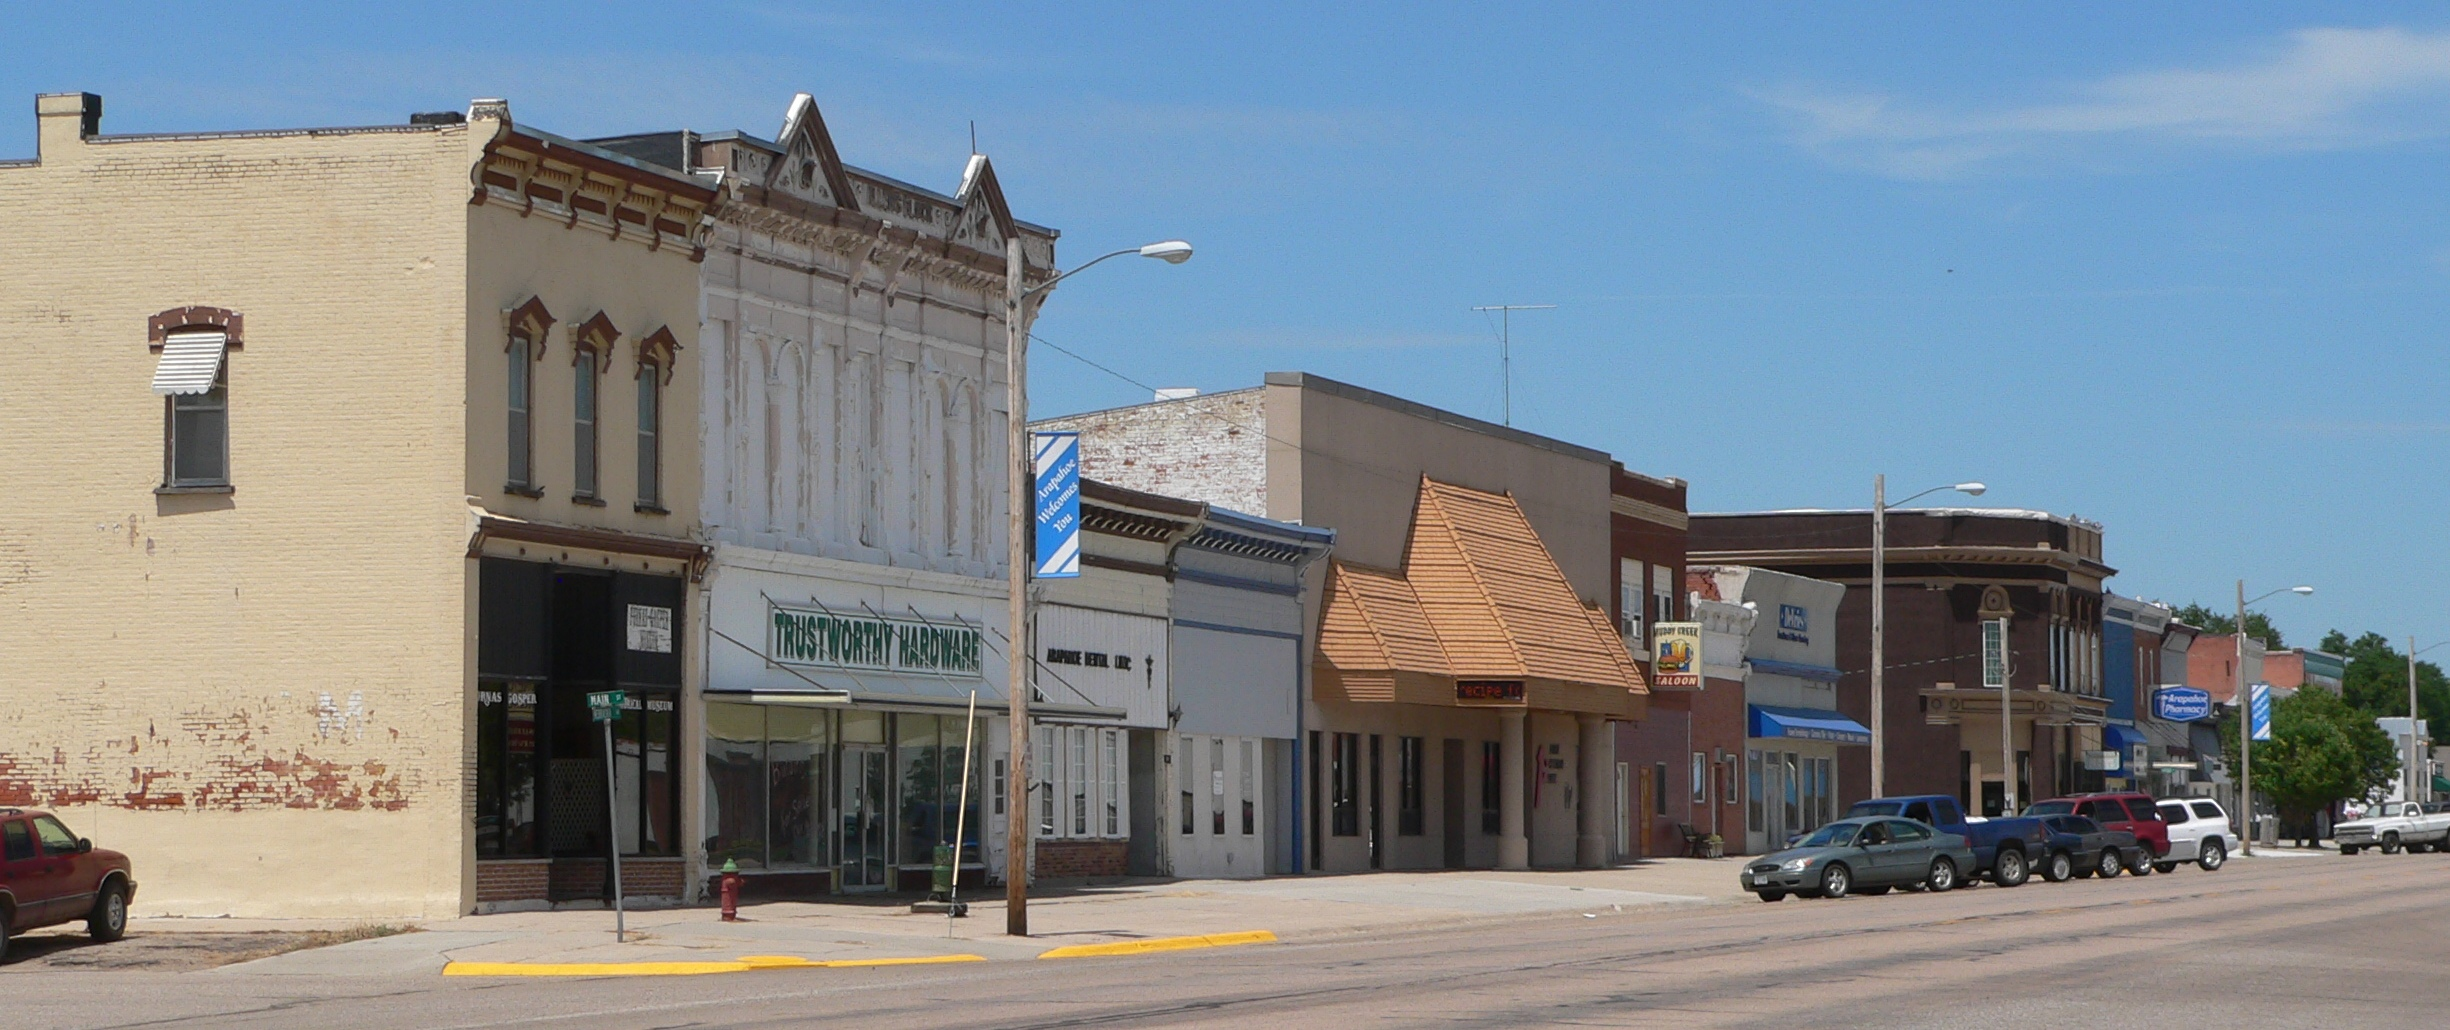 Arapahoe Funeral Homes Funeral Services Flowers In Nebraska